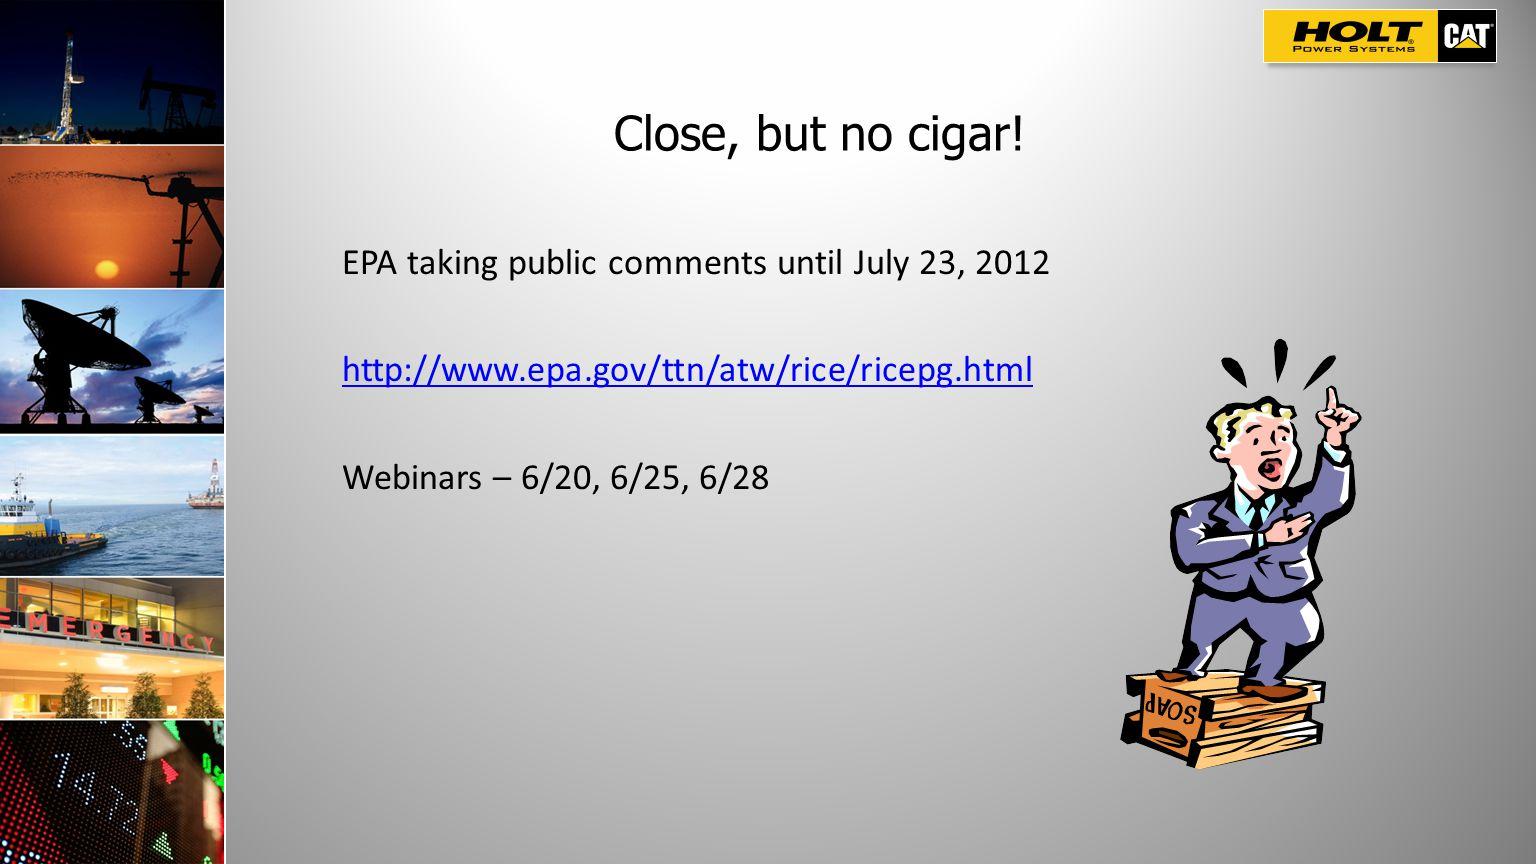 Close, but no cigar! EPA taking public comments until July 23, 2012